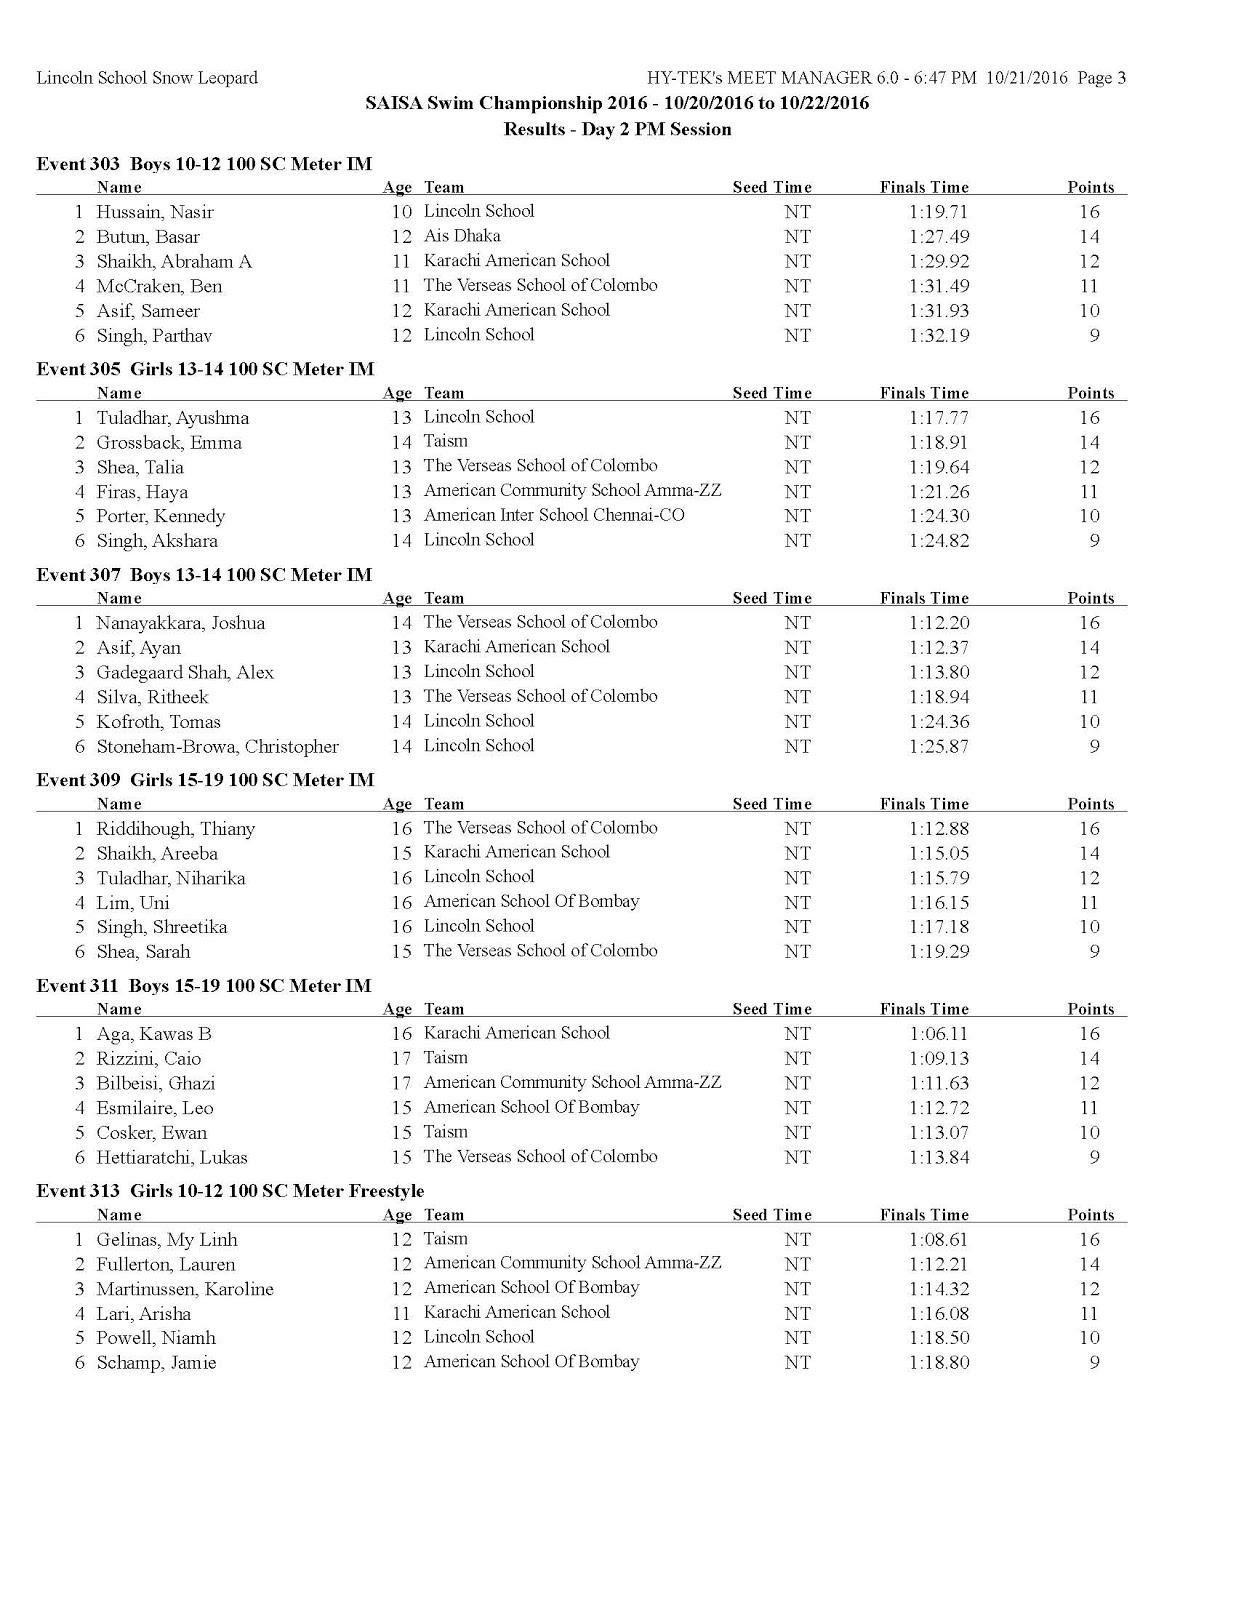 SAISA Swimming 2016. October 20-22. Kathmandu, Nepal: Results Day2